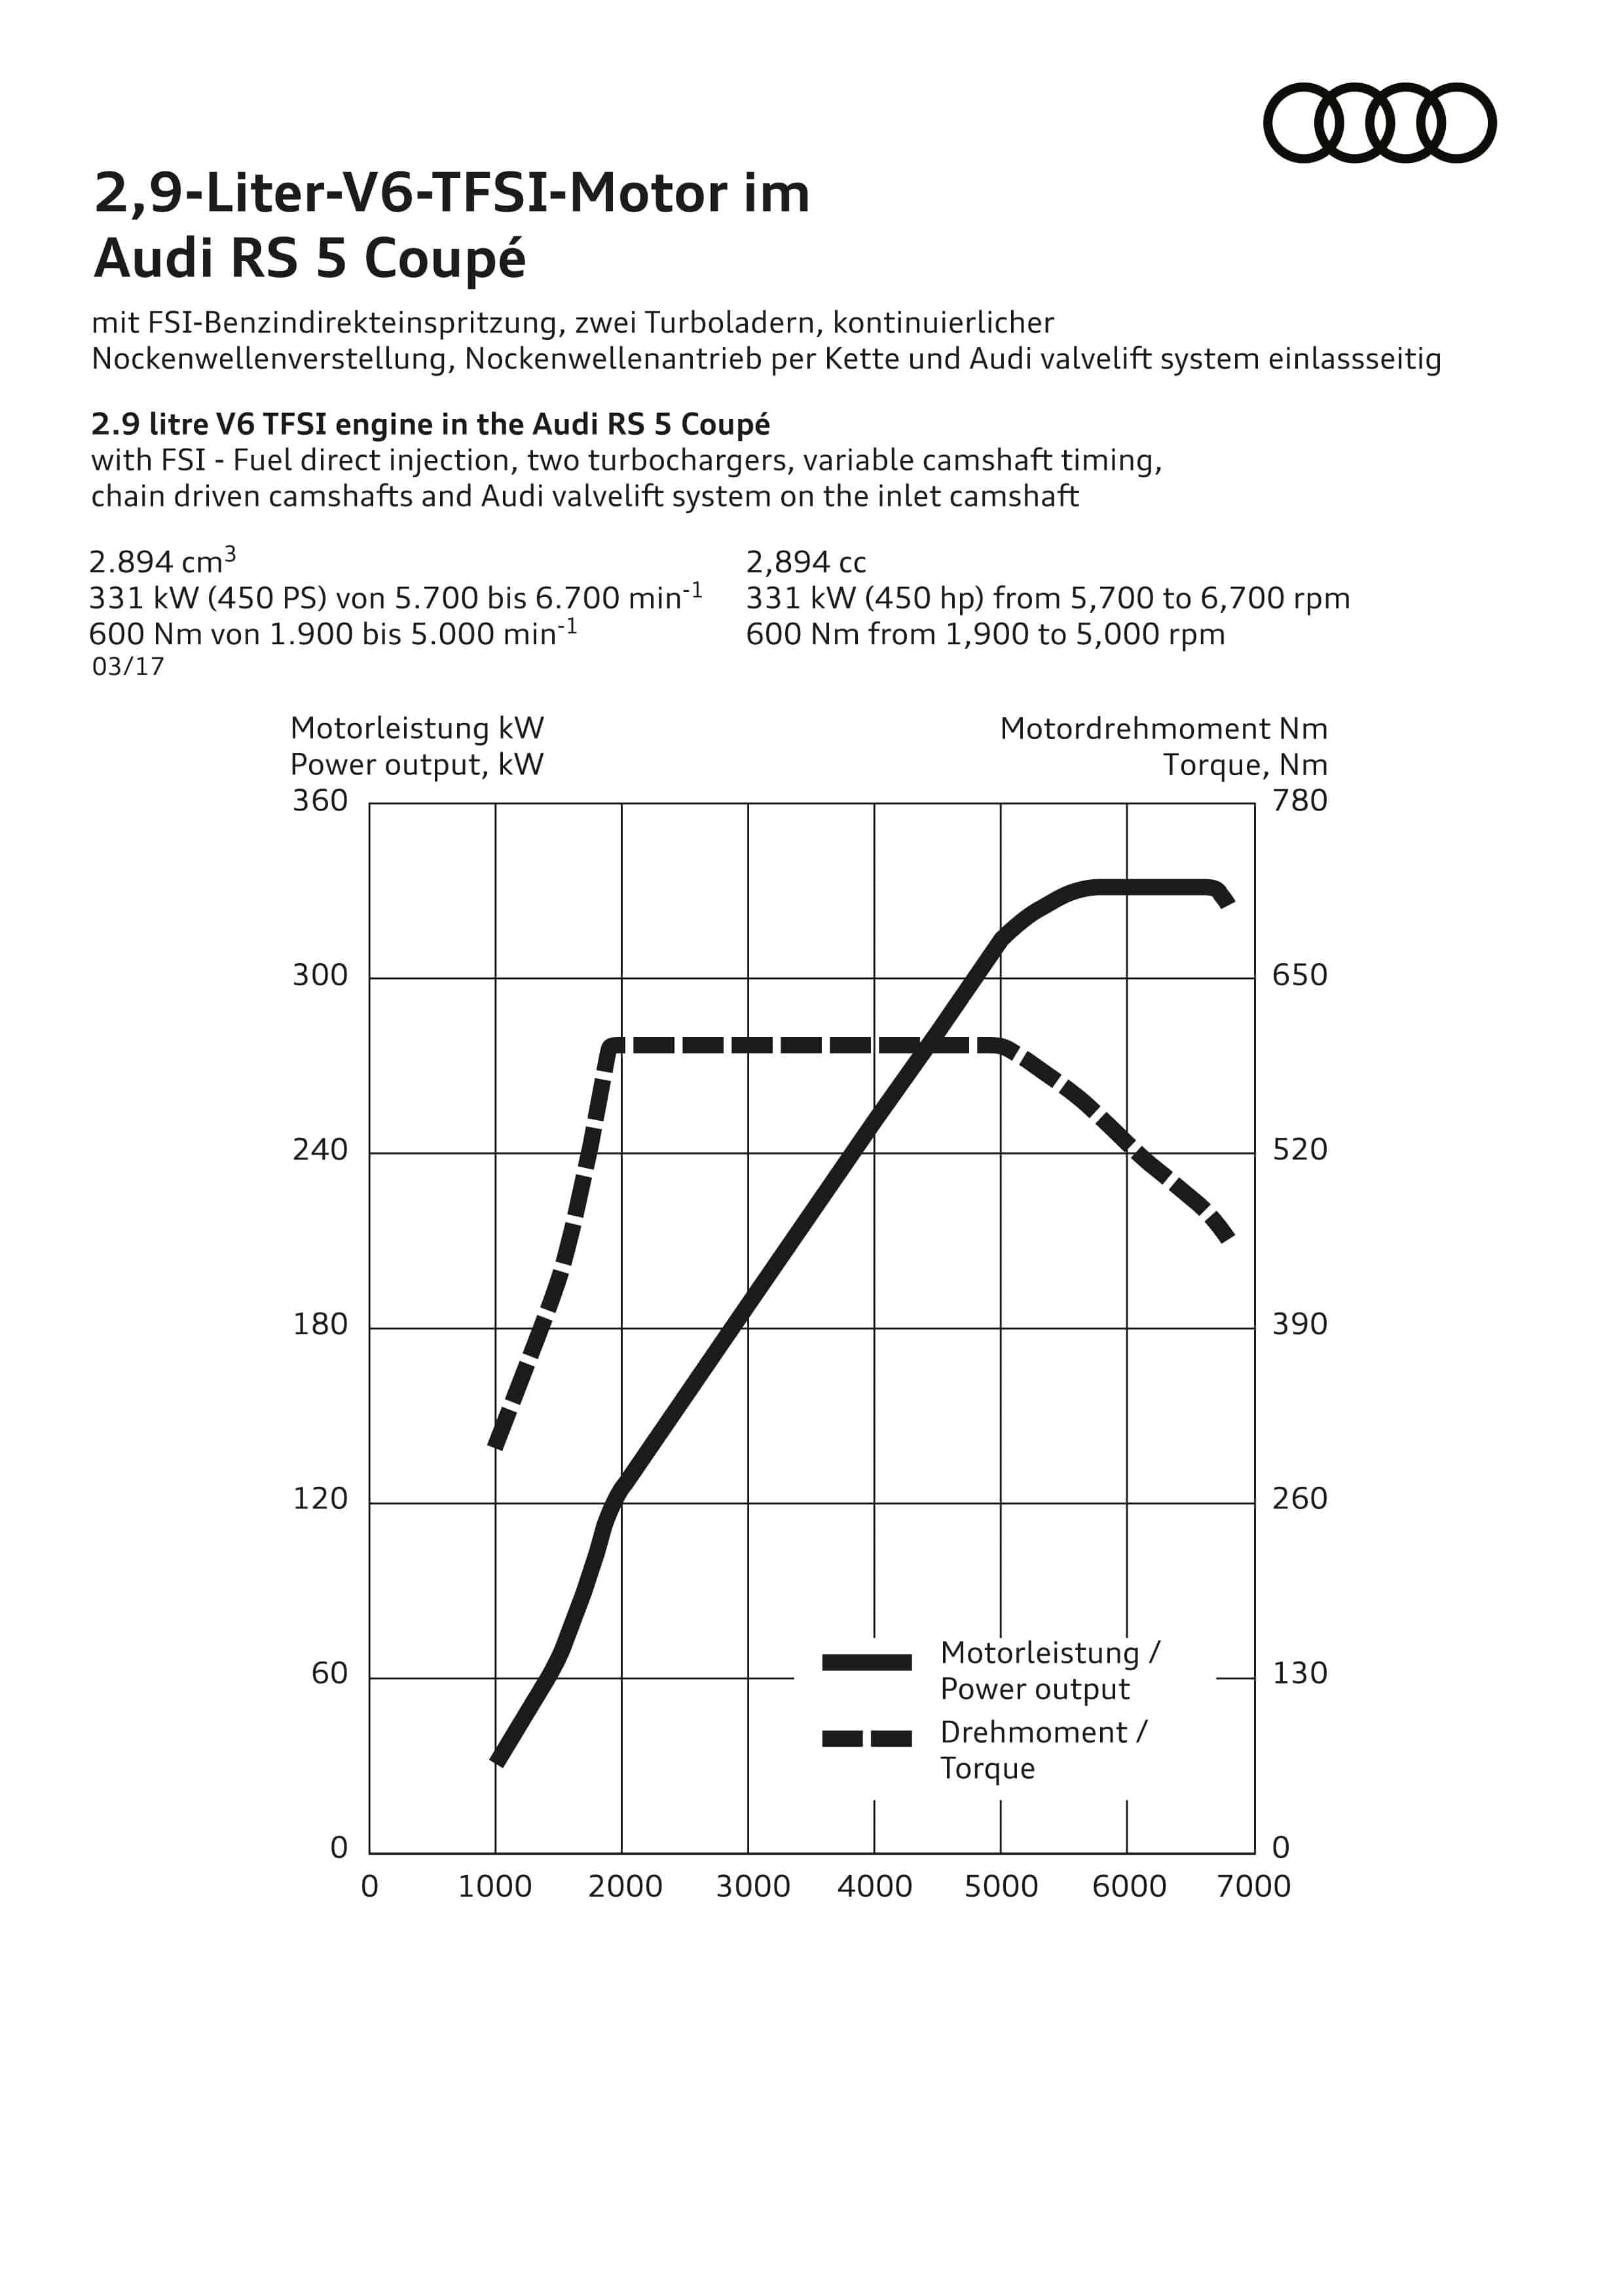 Leistungsdiagramm des 2.9 Liter V6 TFSI Motor - Audi RS 5 Coupé